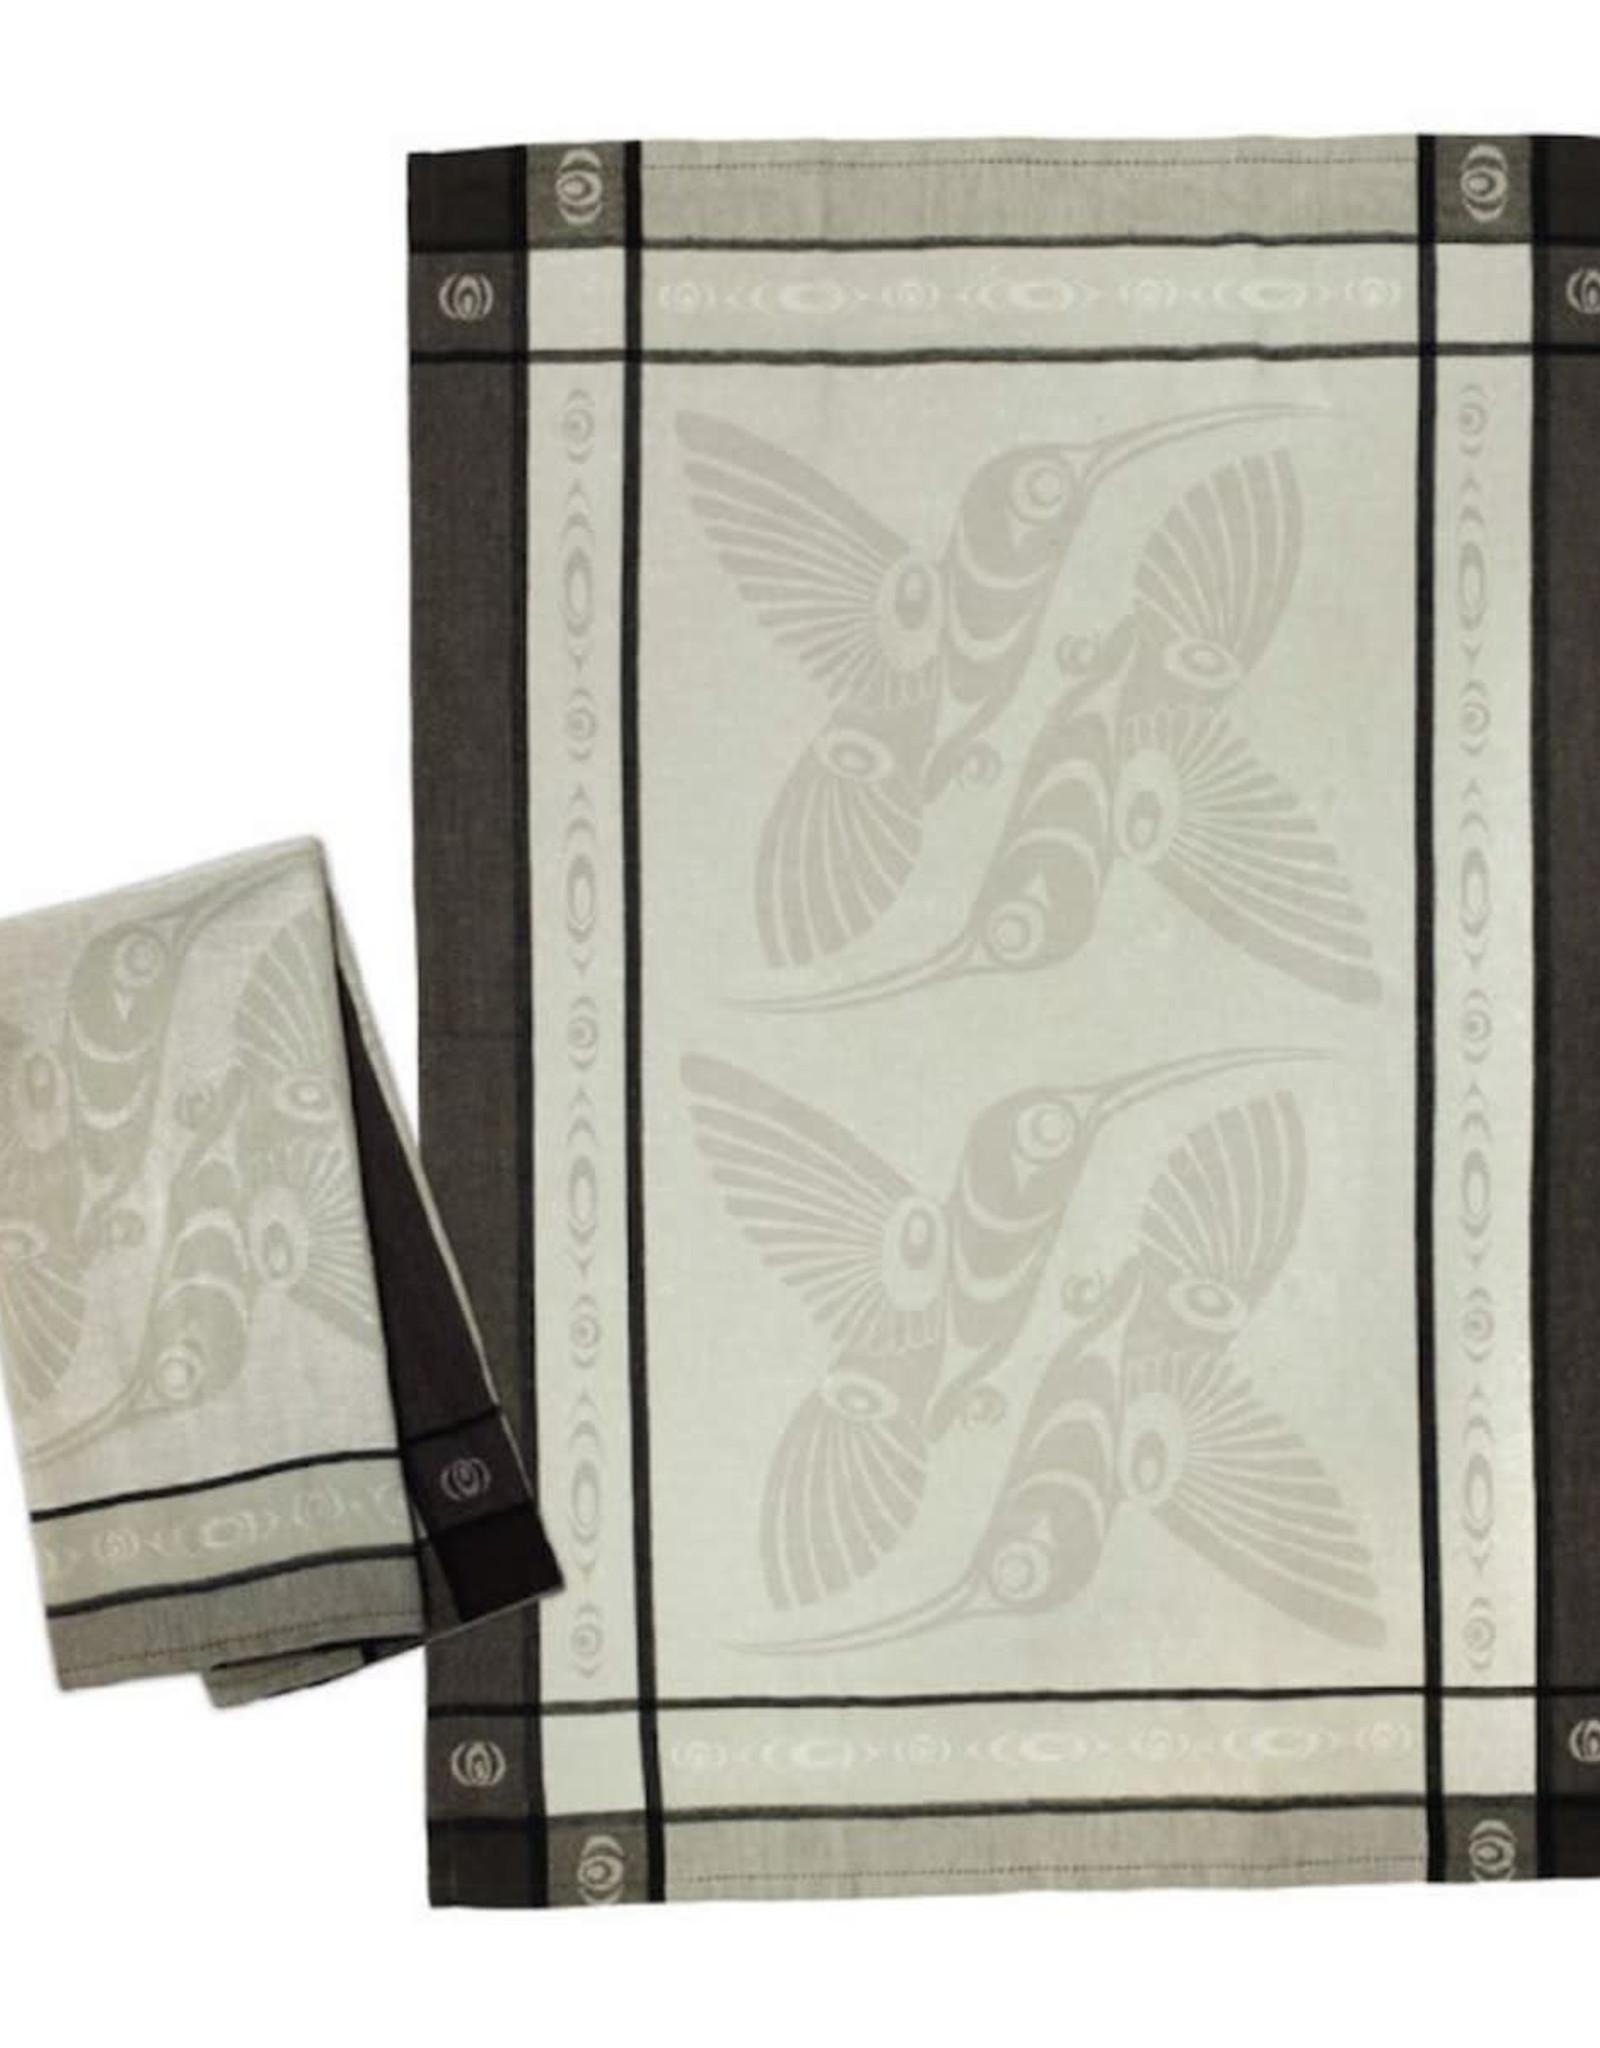 Tea Towel (Beige) - The offering by Francis Horne Sr.